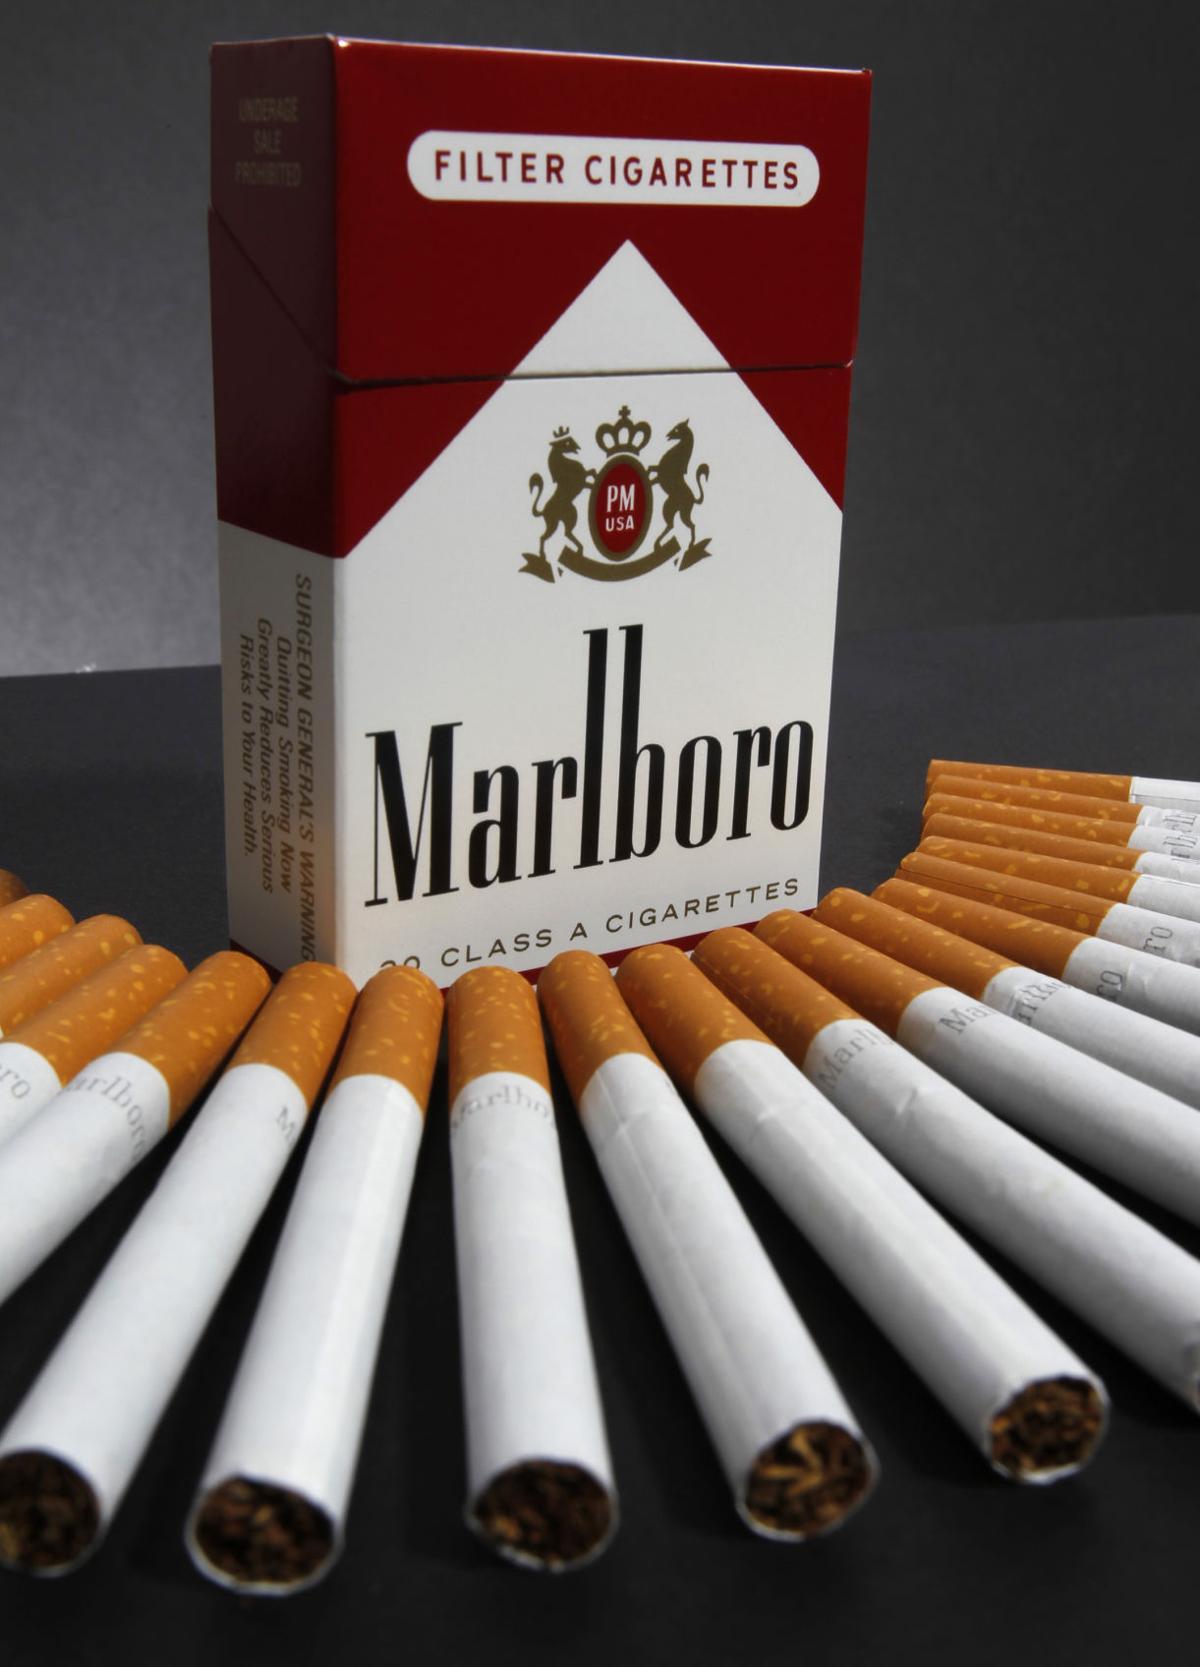 Marlboro maker Altria 3Q profit falls on charges